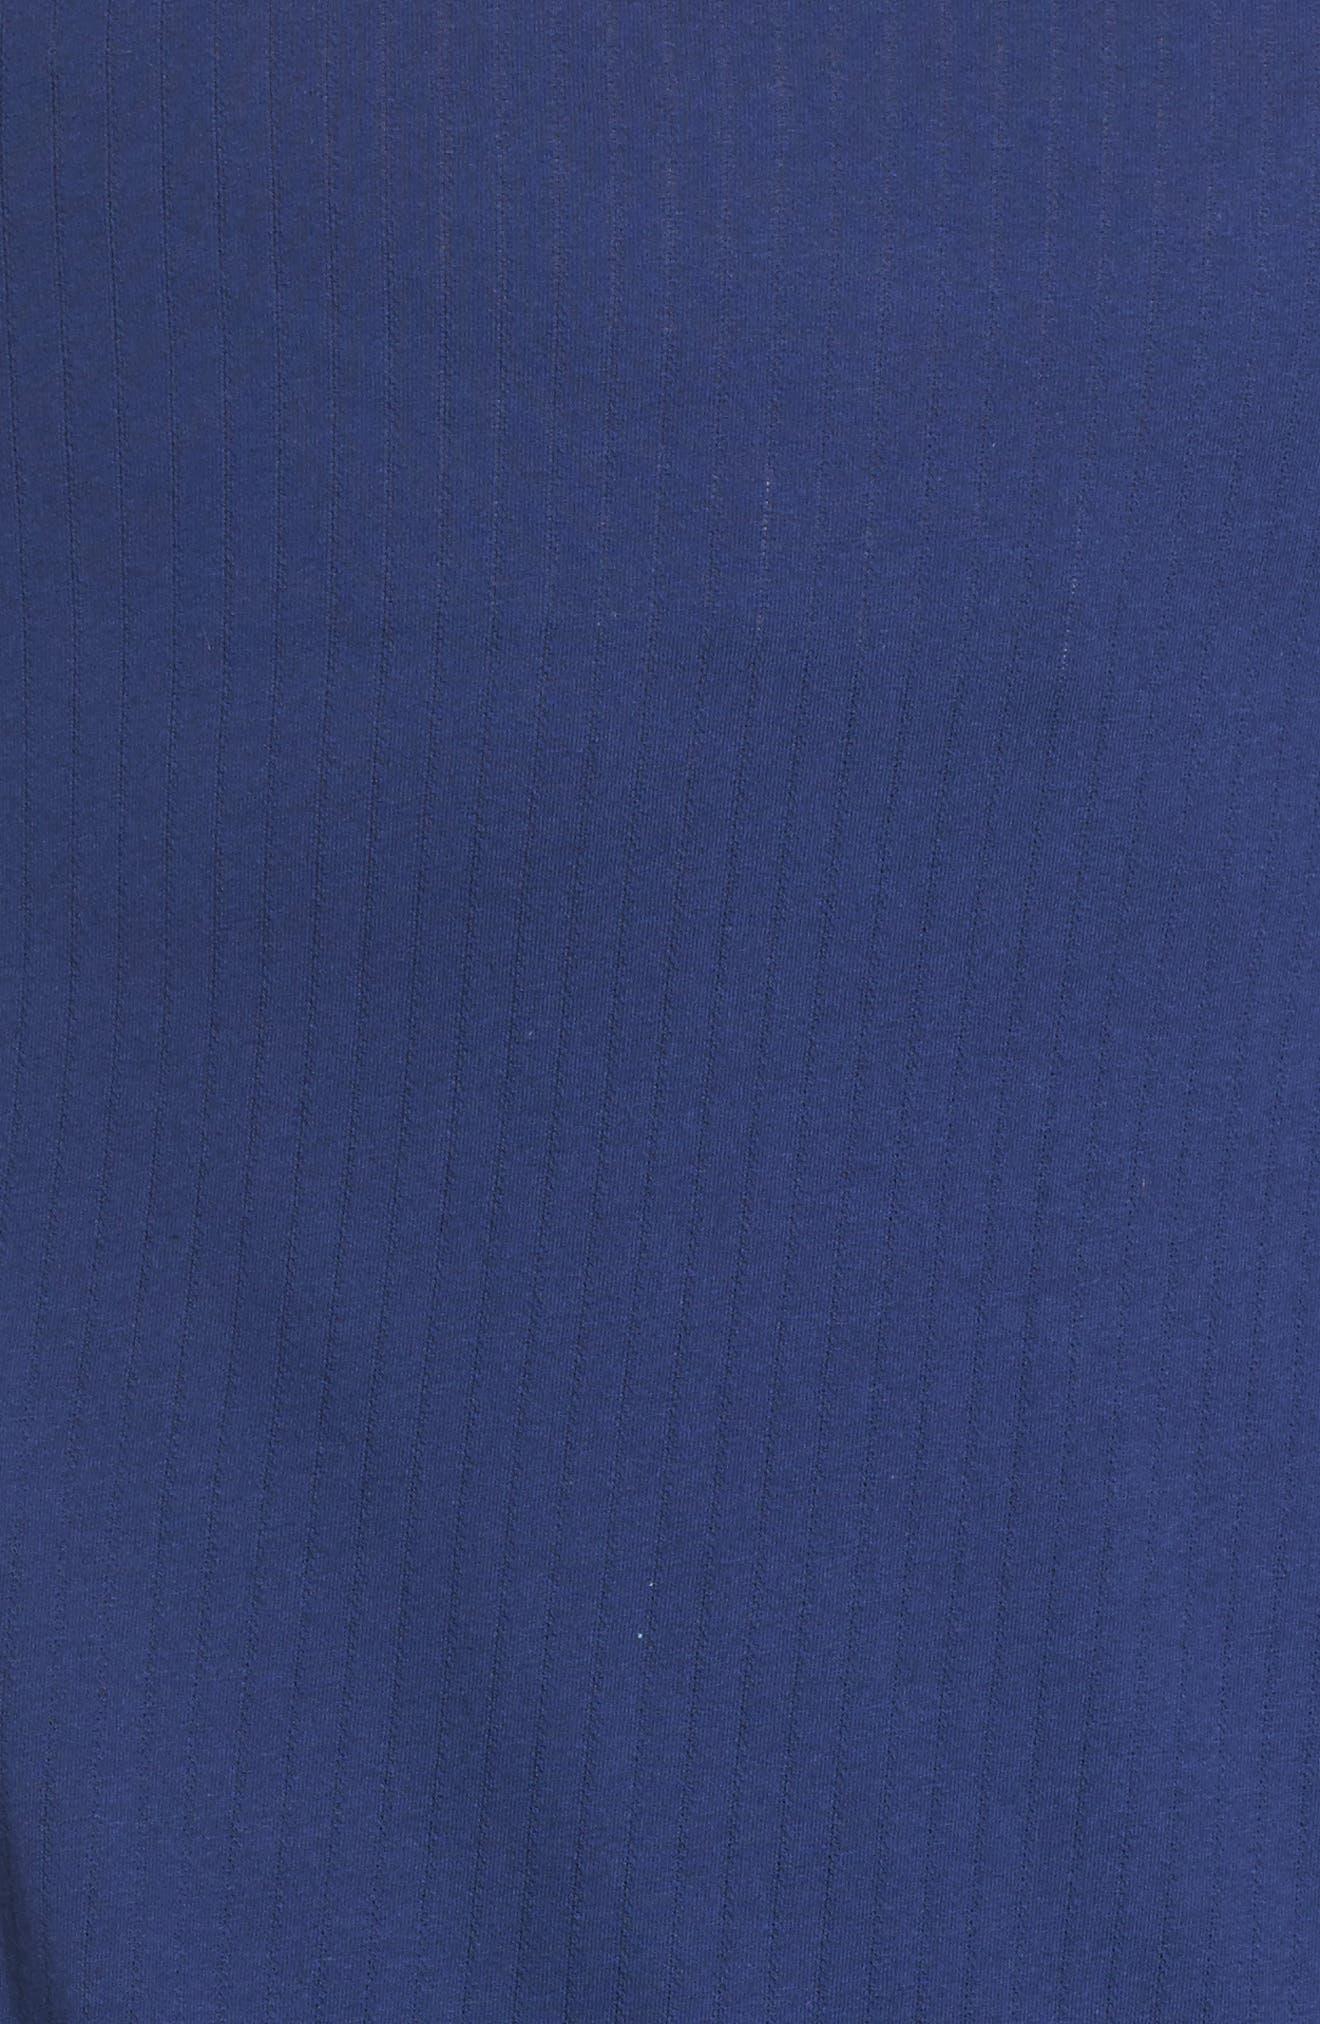 Notched Collar Pajamas,                             Alternate thumbnail 5, color,                             Navy